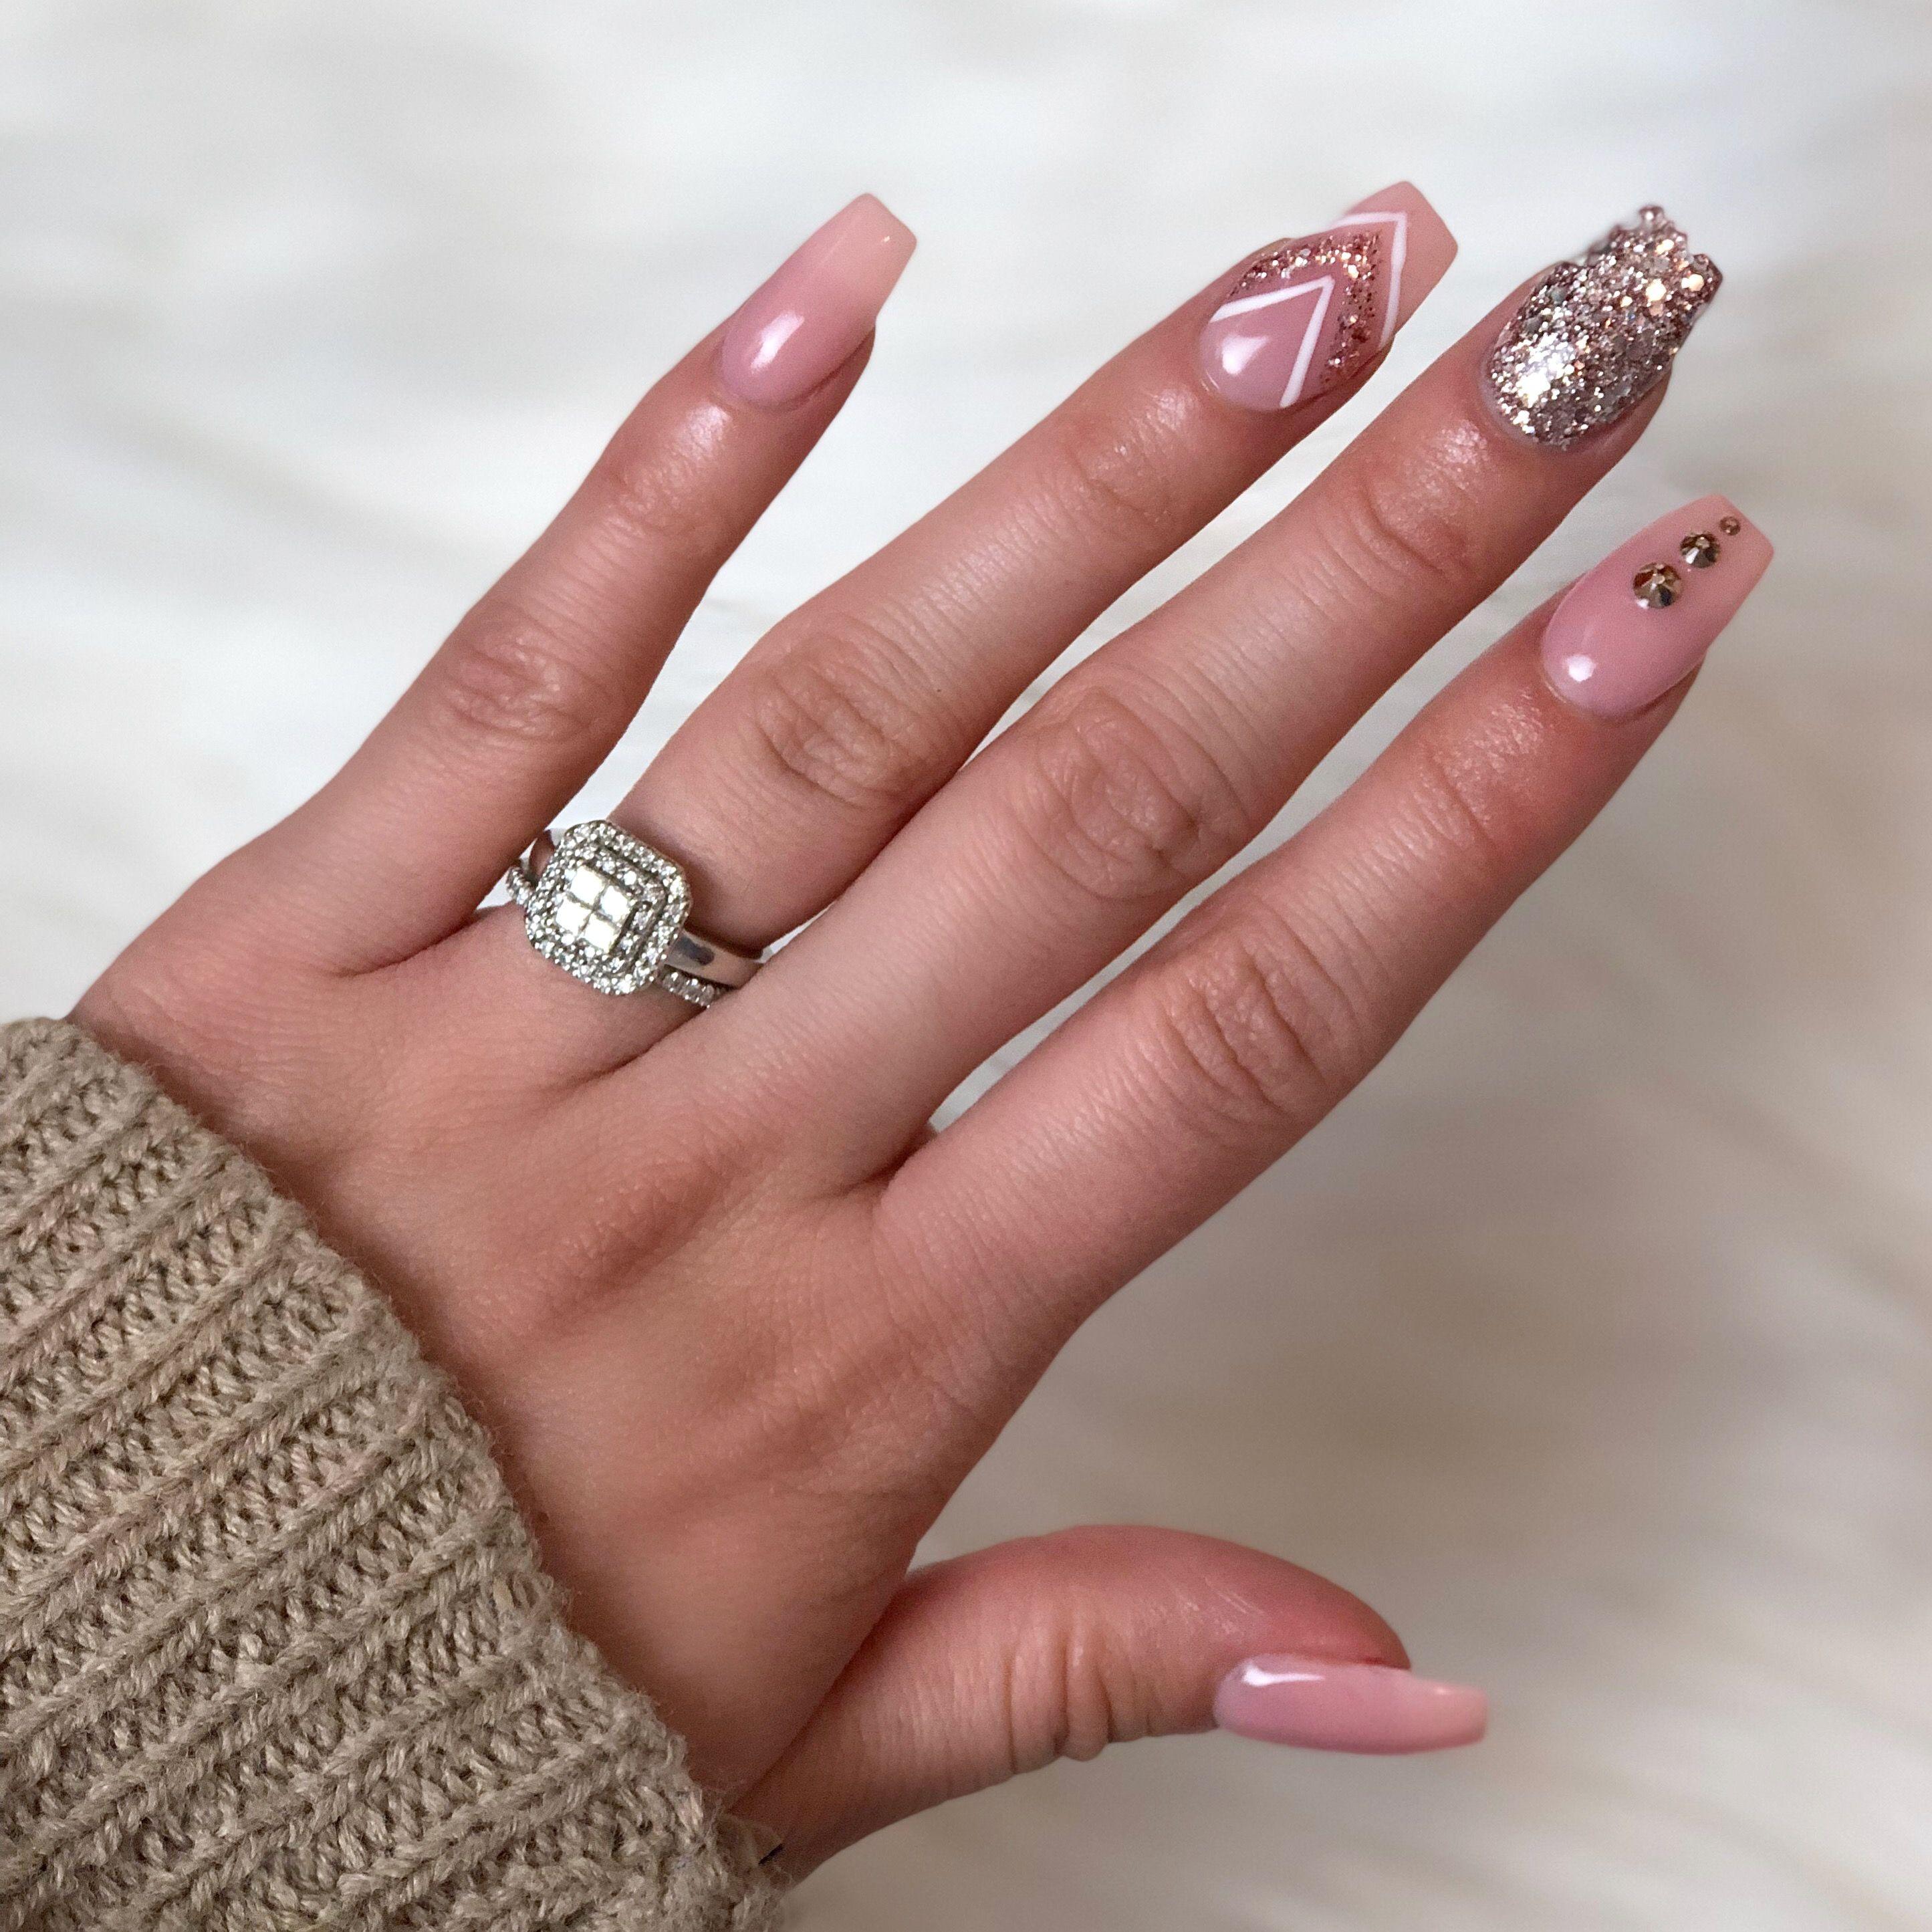 Coffin nails ✨ pink | Nails | Pinterest | Coffin nails, Nail inspo ...